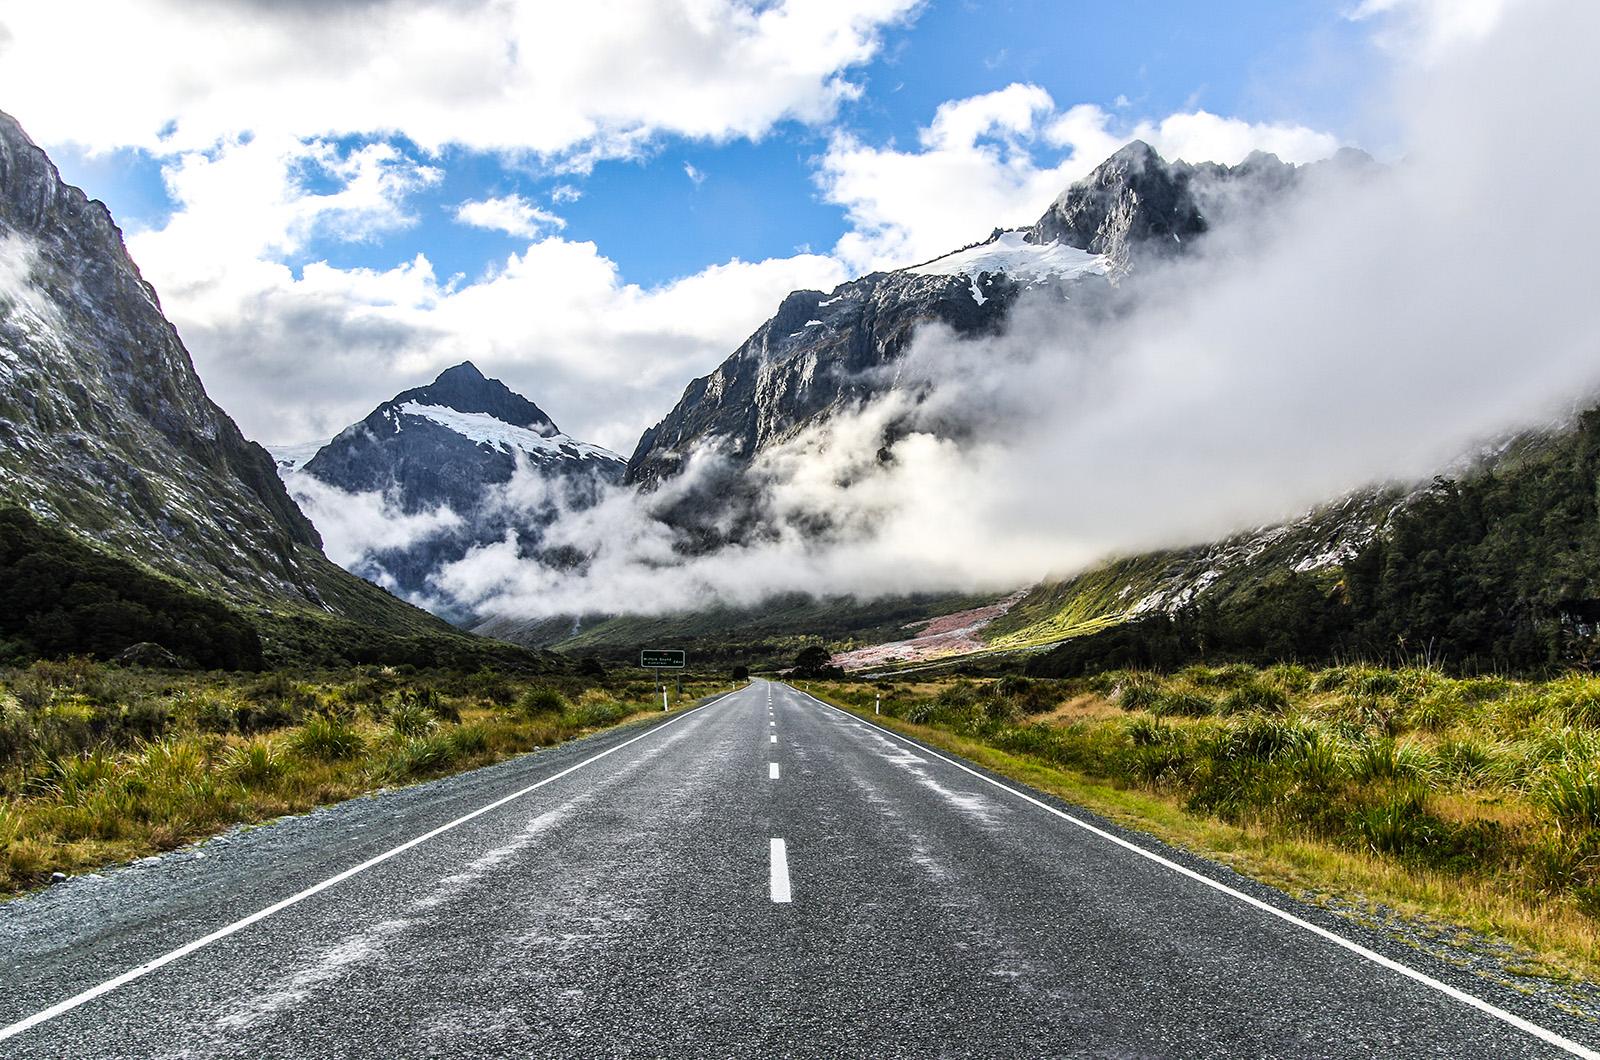 Milford Road, New Zealand Road Trip